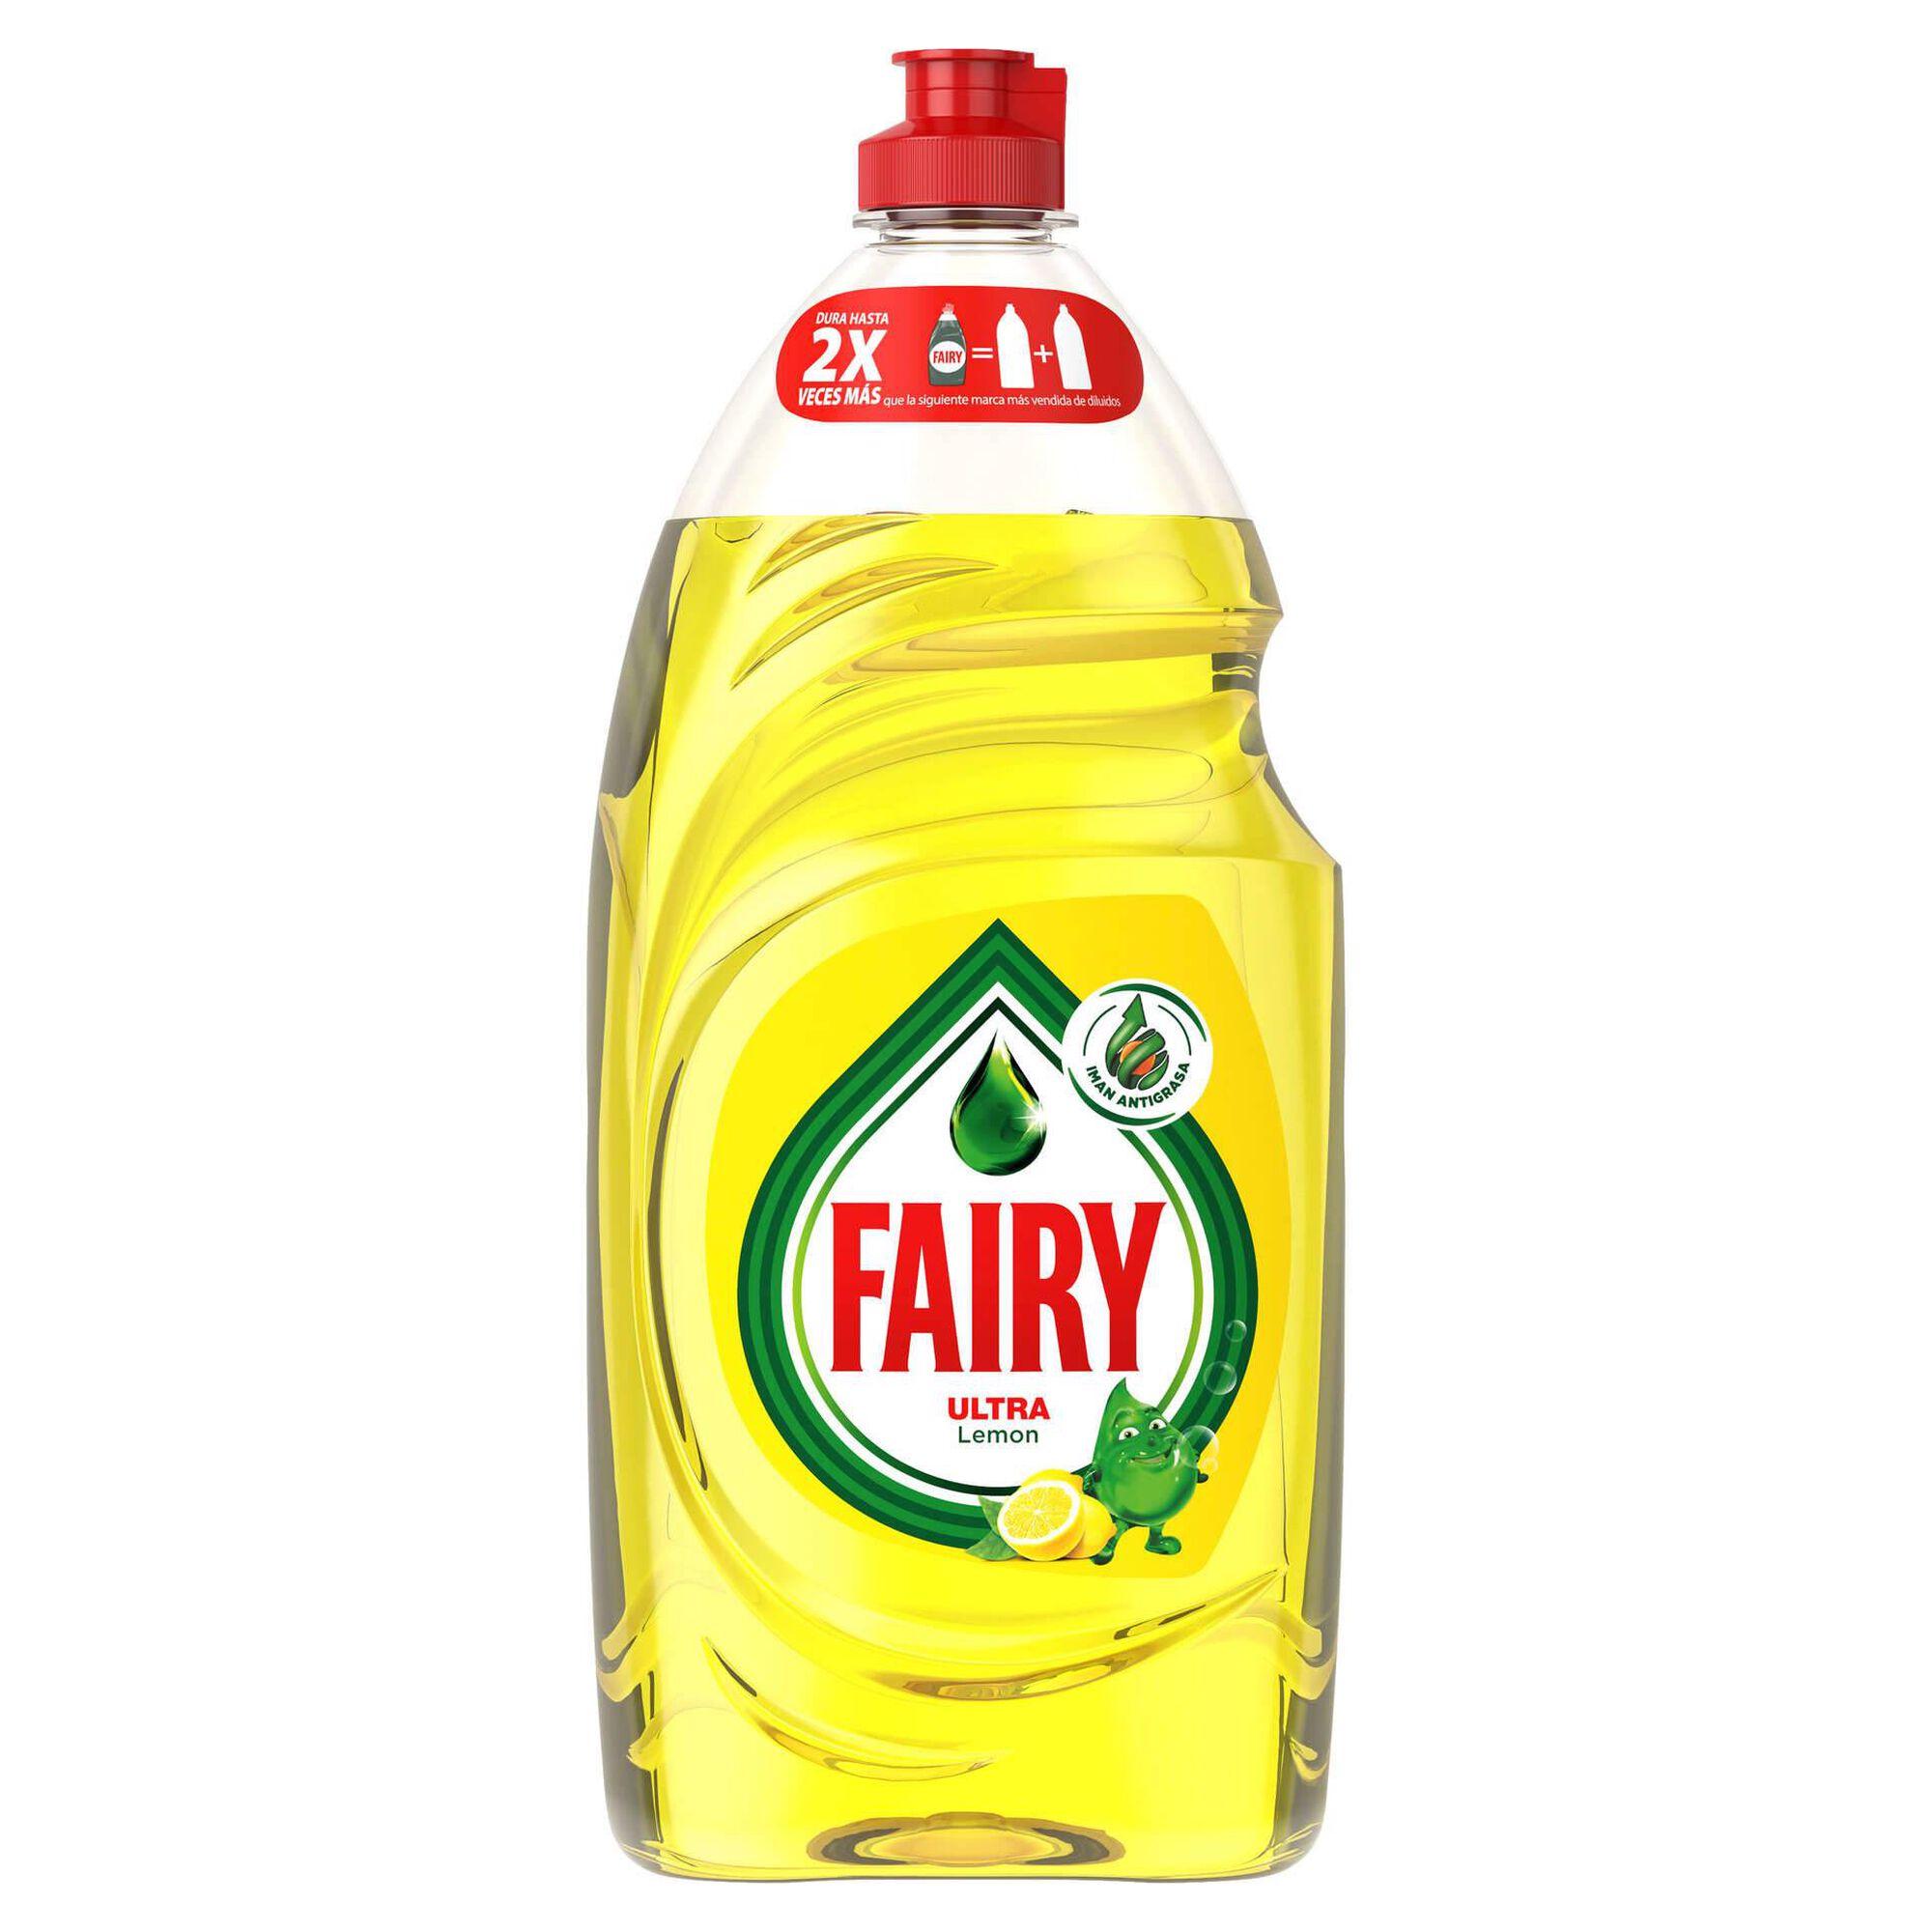 Detergente Manual Loiça Ultra Limão